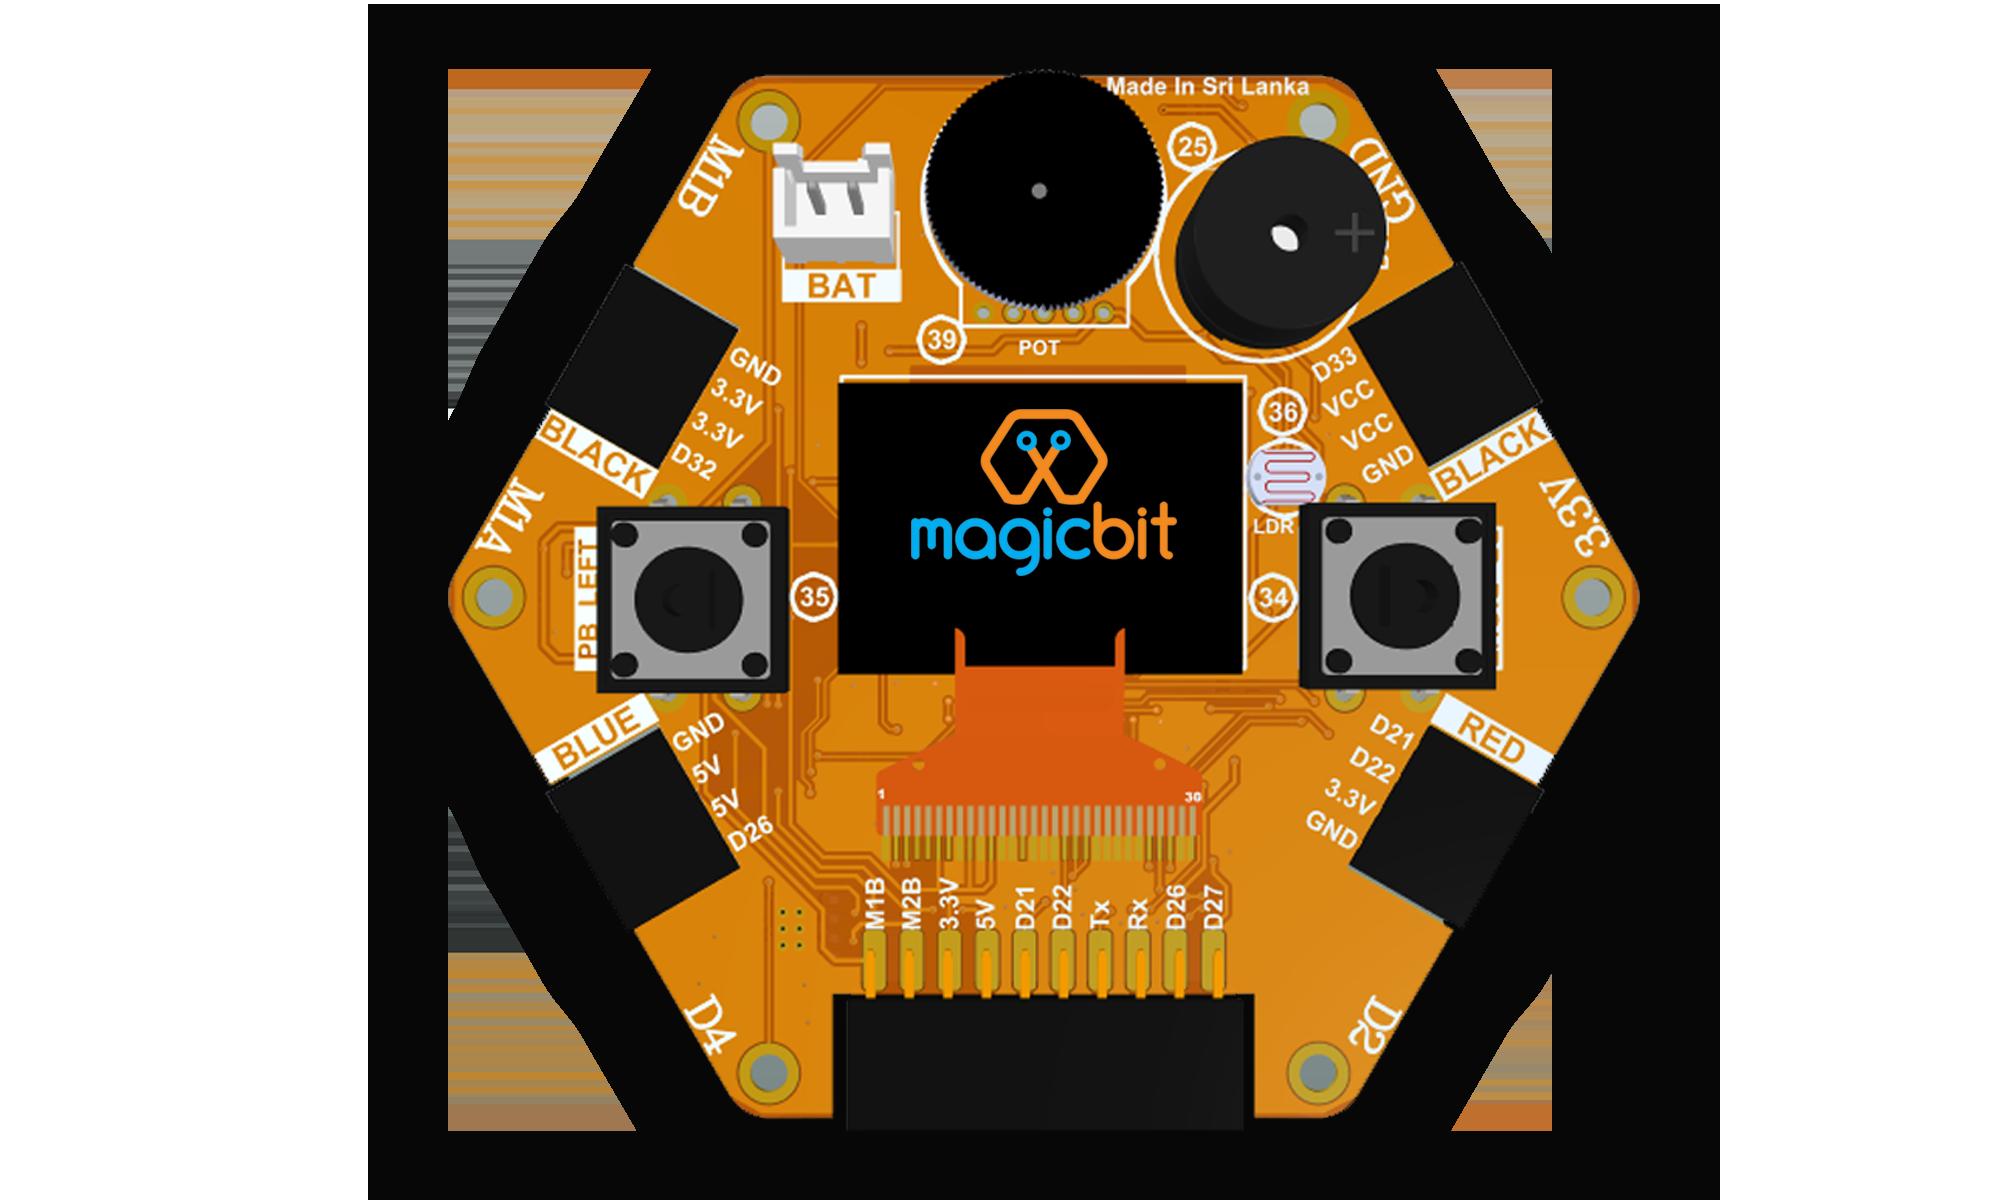 https://github.com/magicbitlk/Magicbit-Arduino/raw/master/Resources/magicbit_unit.png